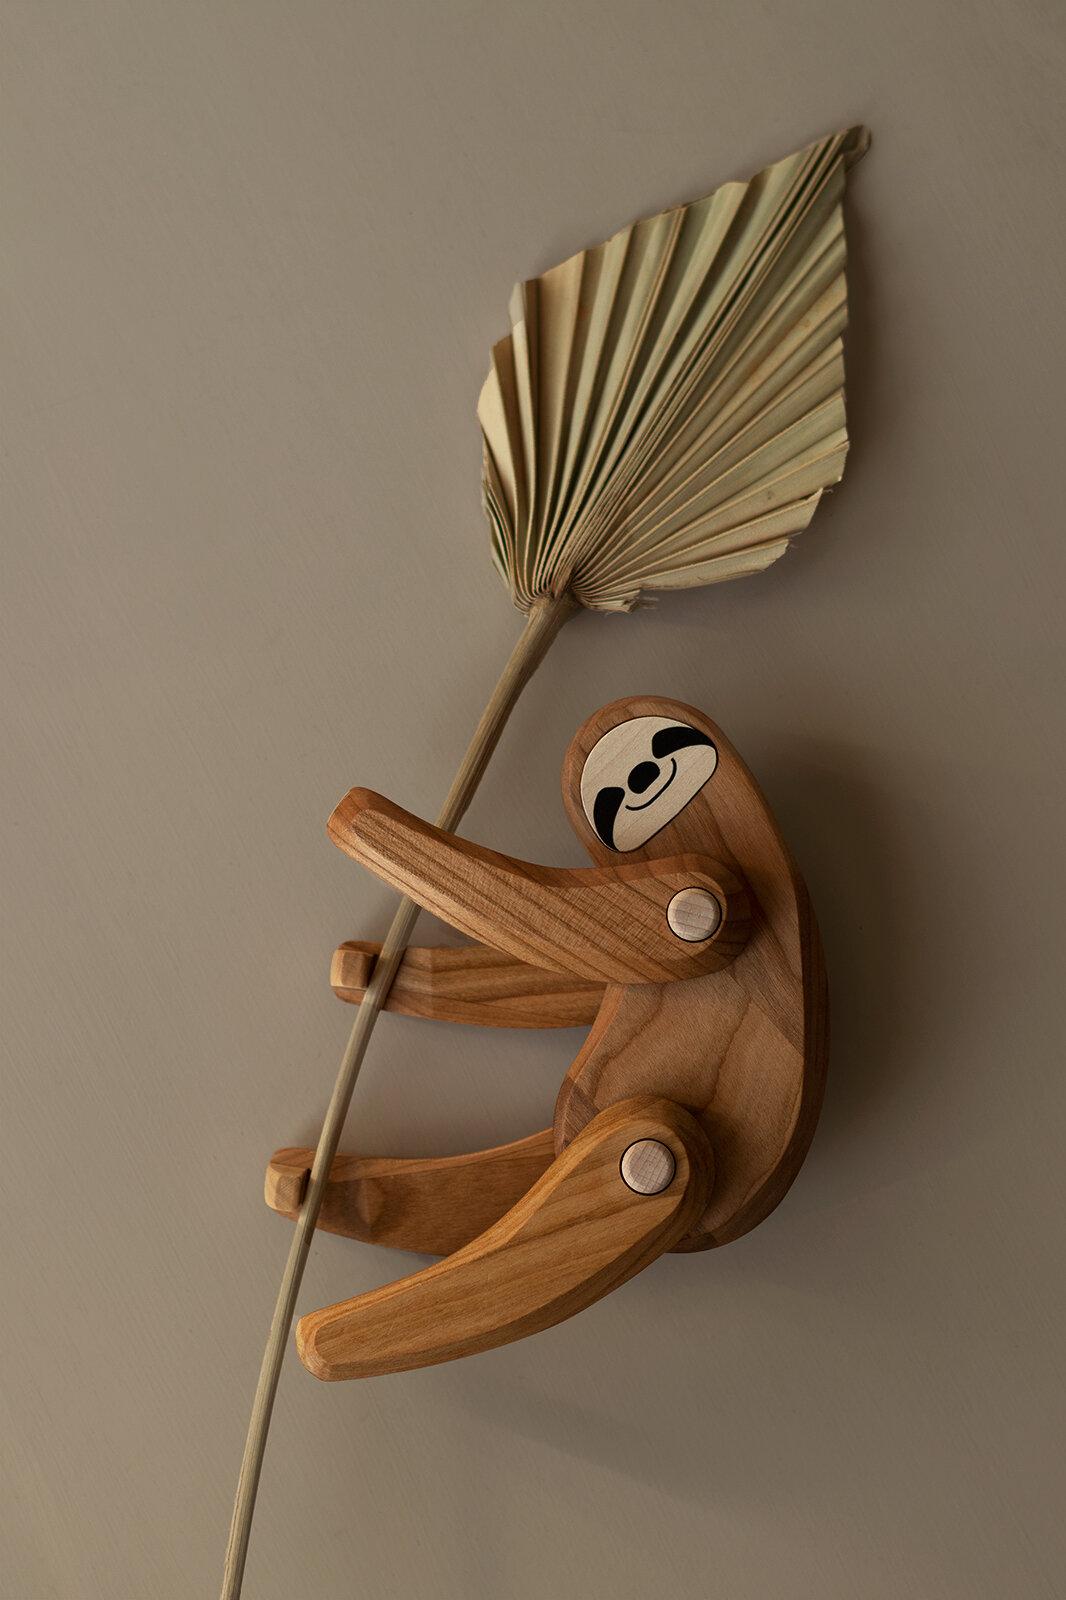 endangered_sloth_wooden_toy_2.jpg